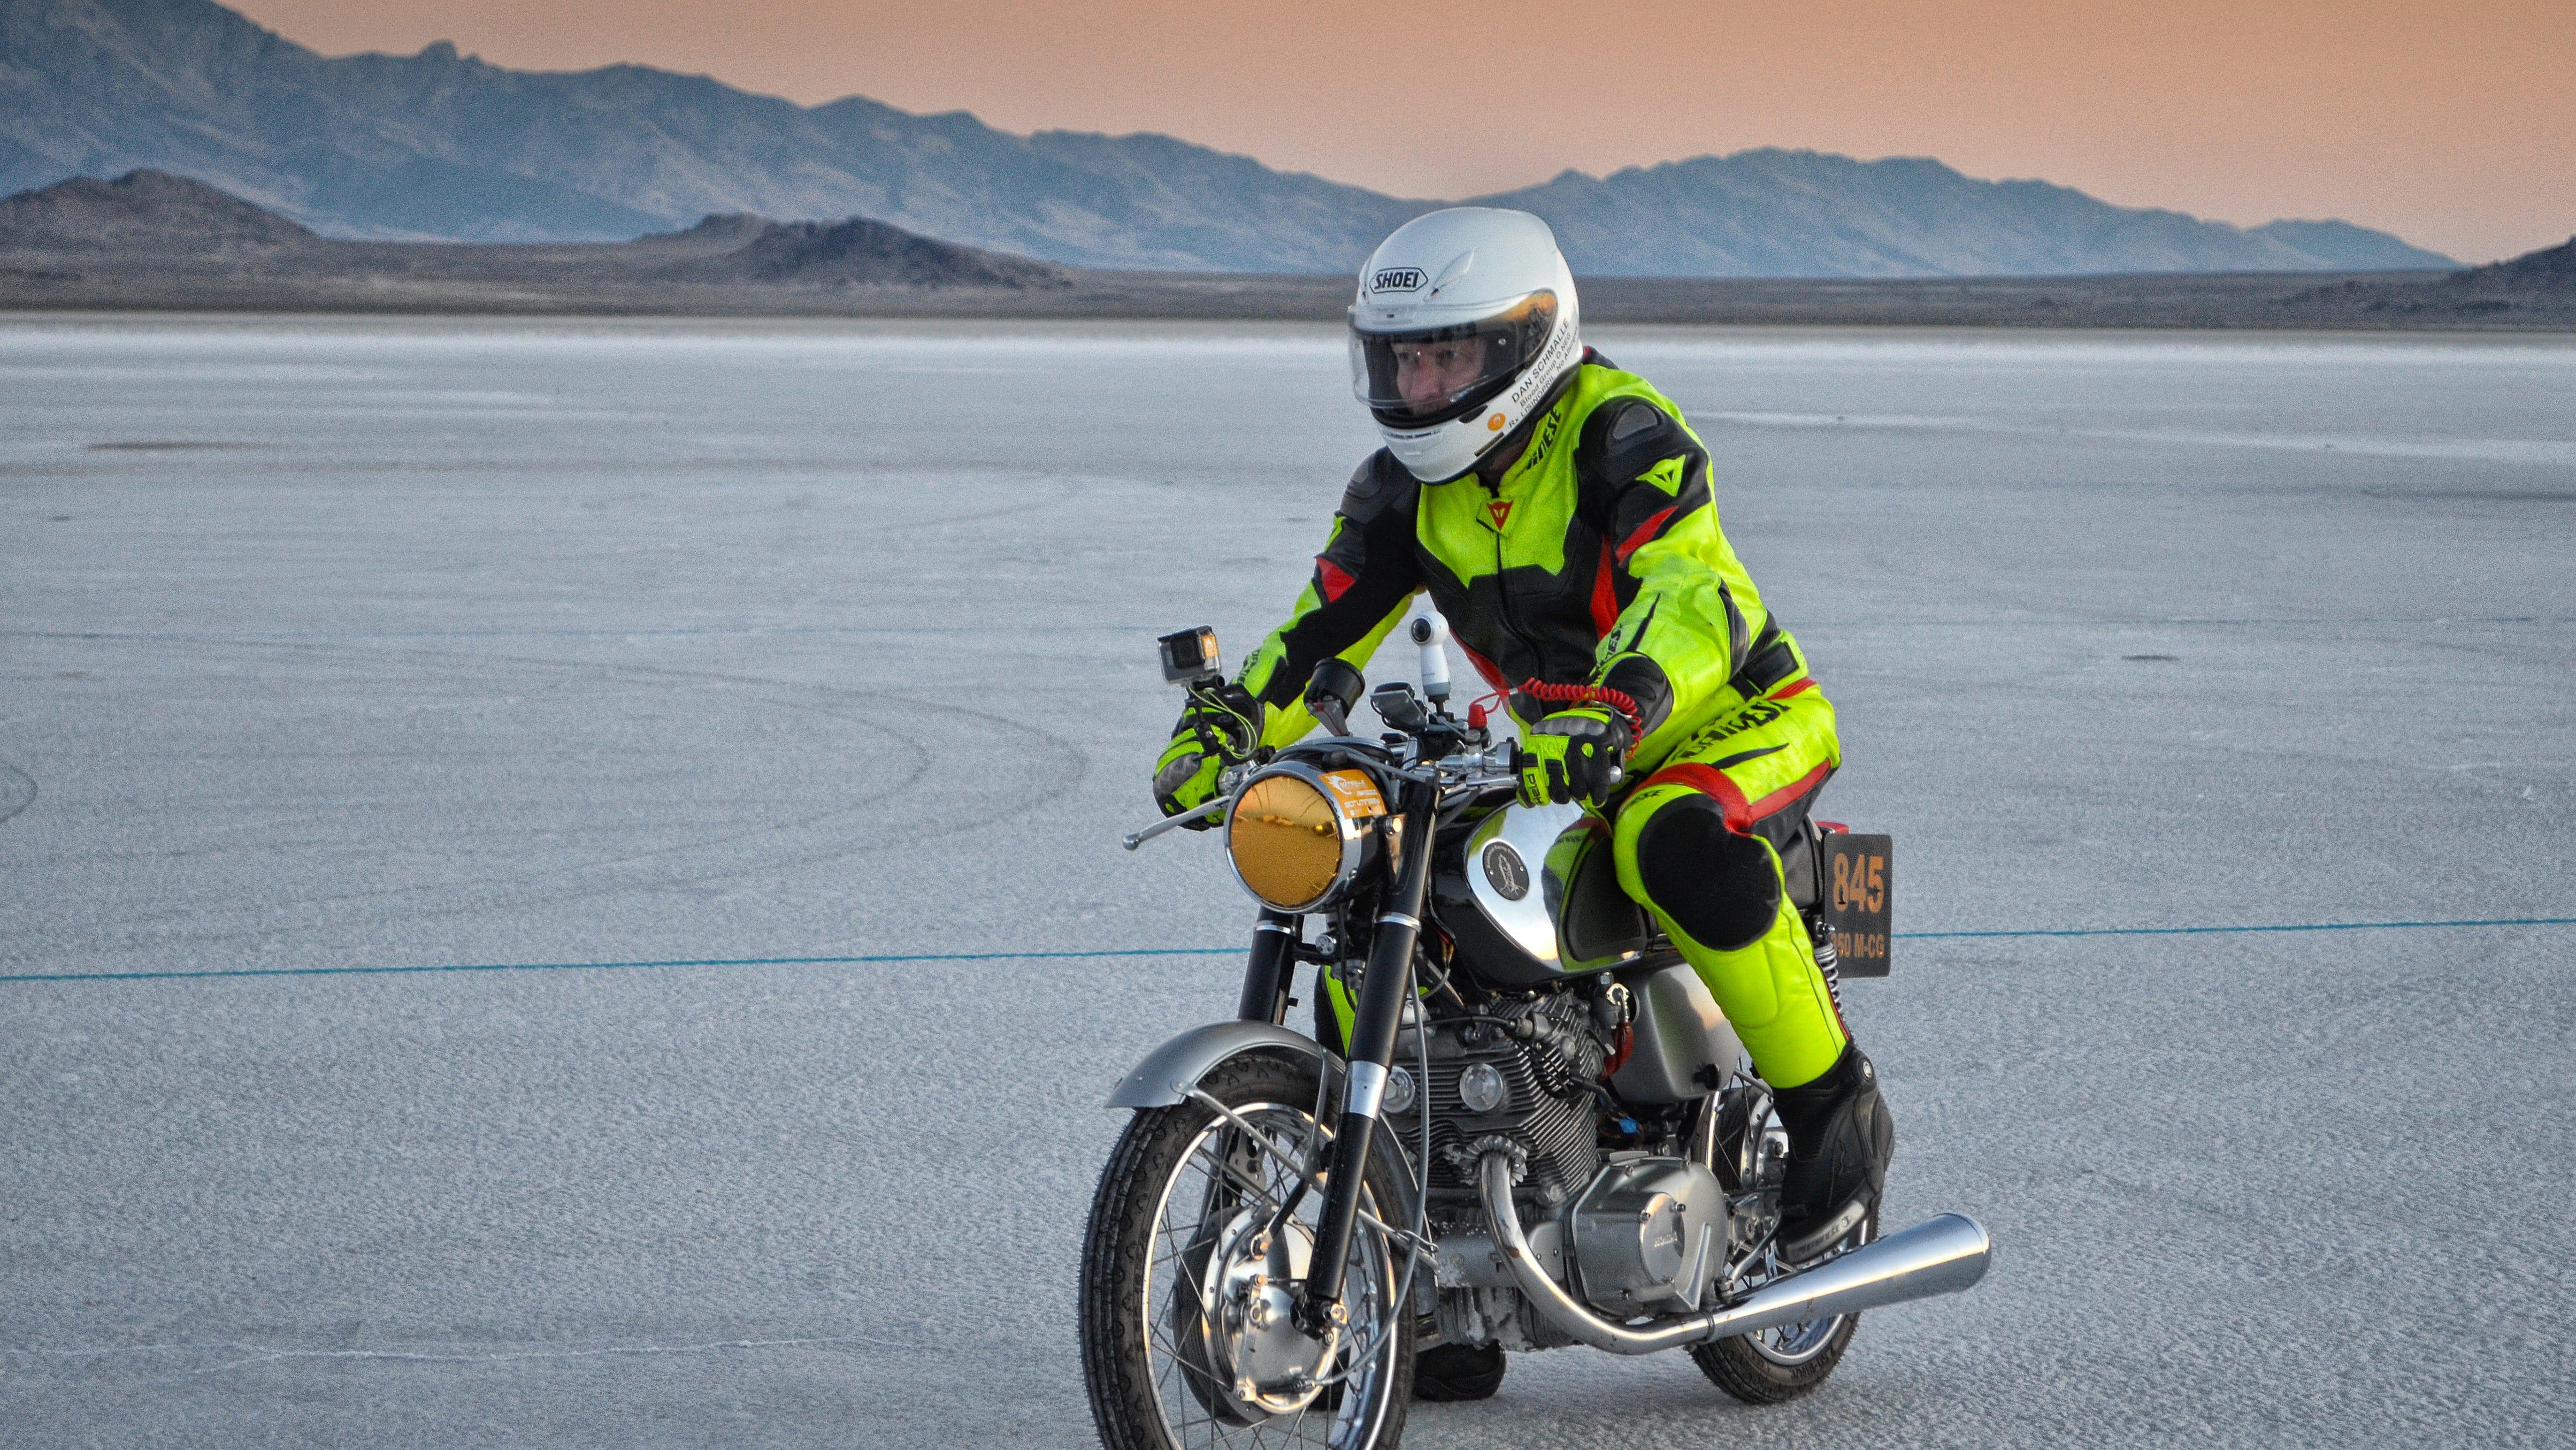 Poulsbo man breaks land speed record on a 1962 motorcycle